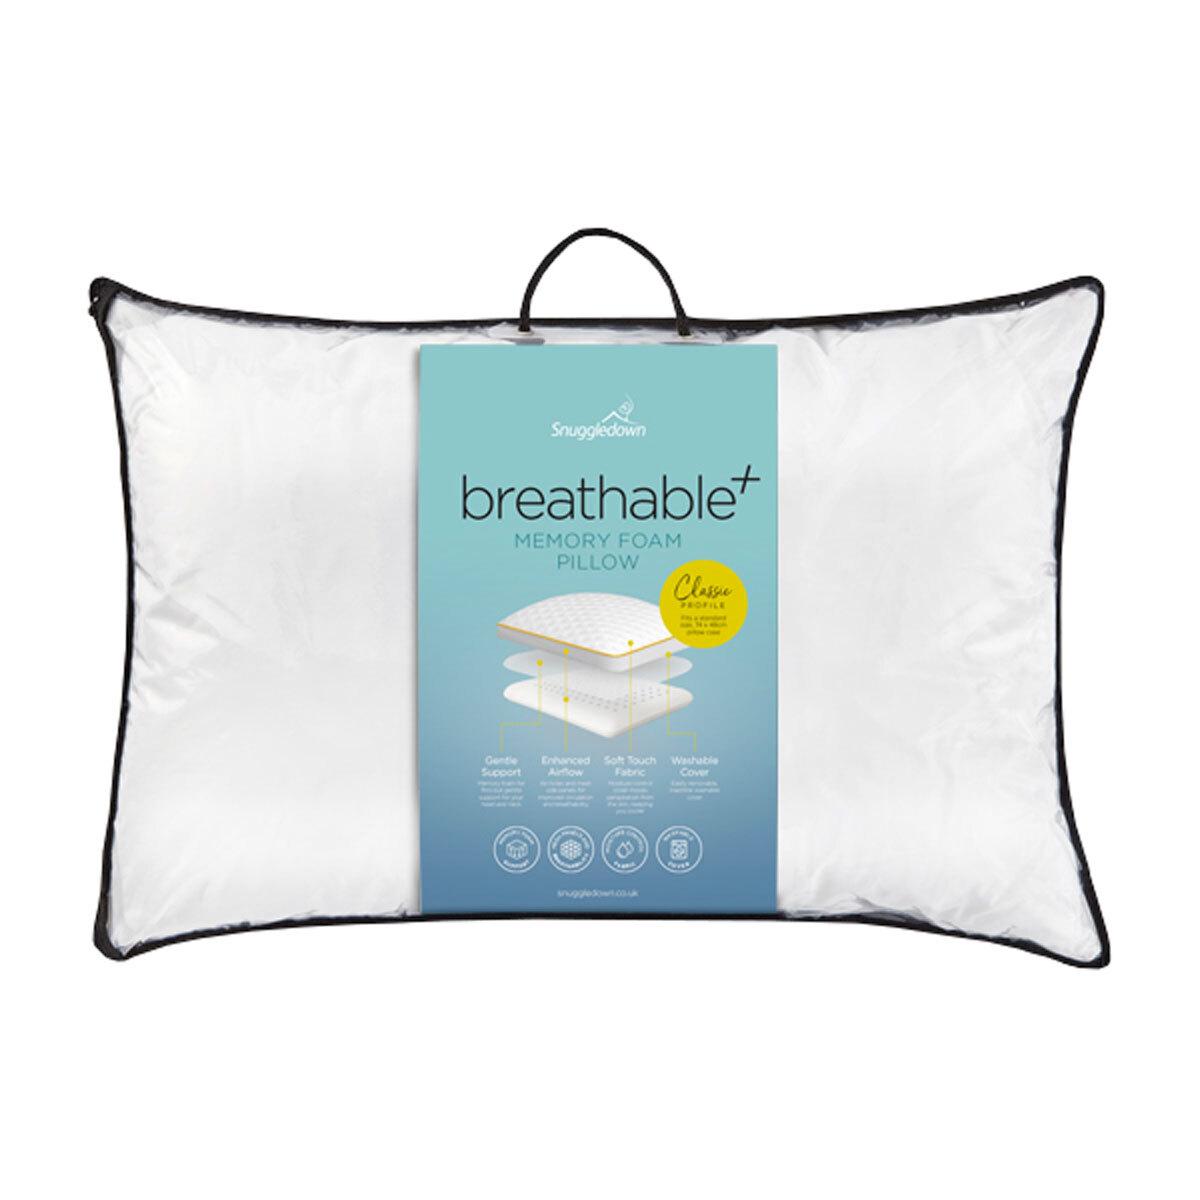 snuggledown breathable classic profile memory foam pillow costco uk